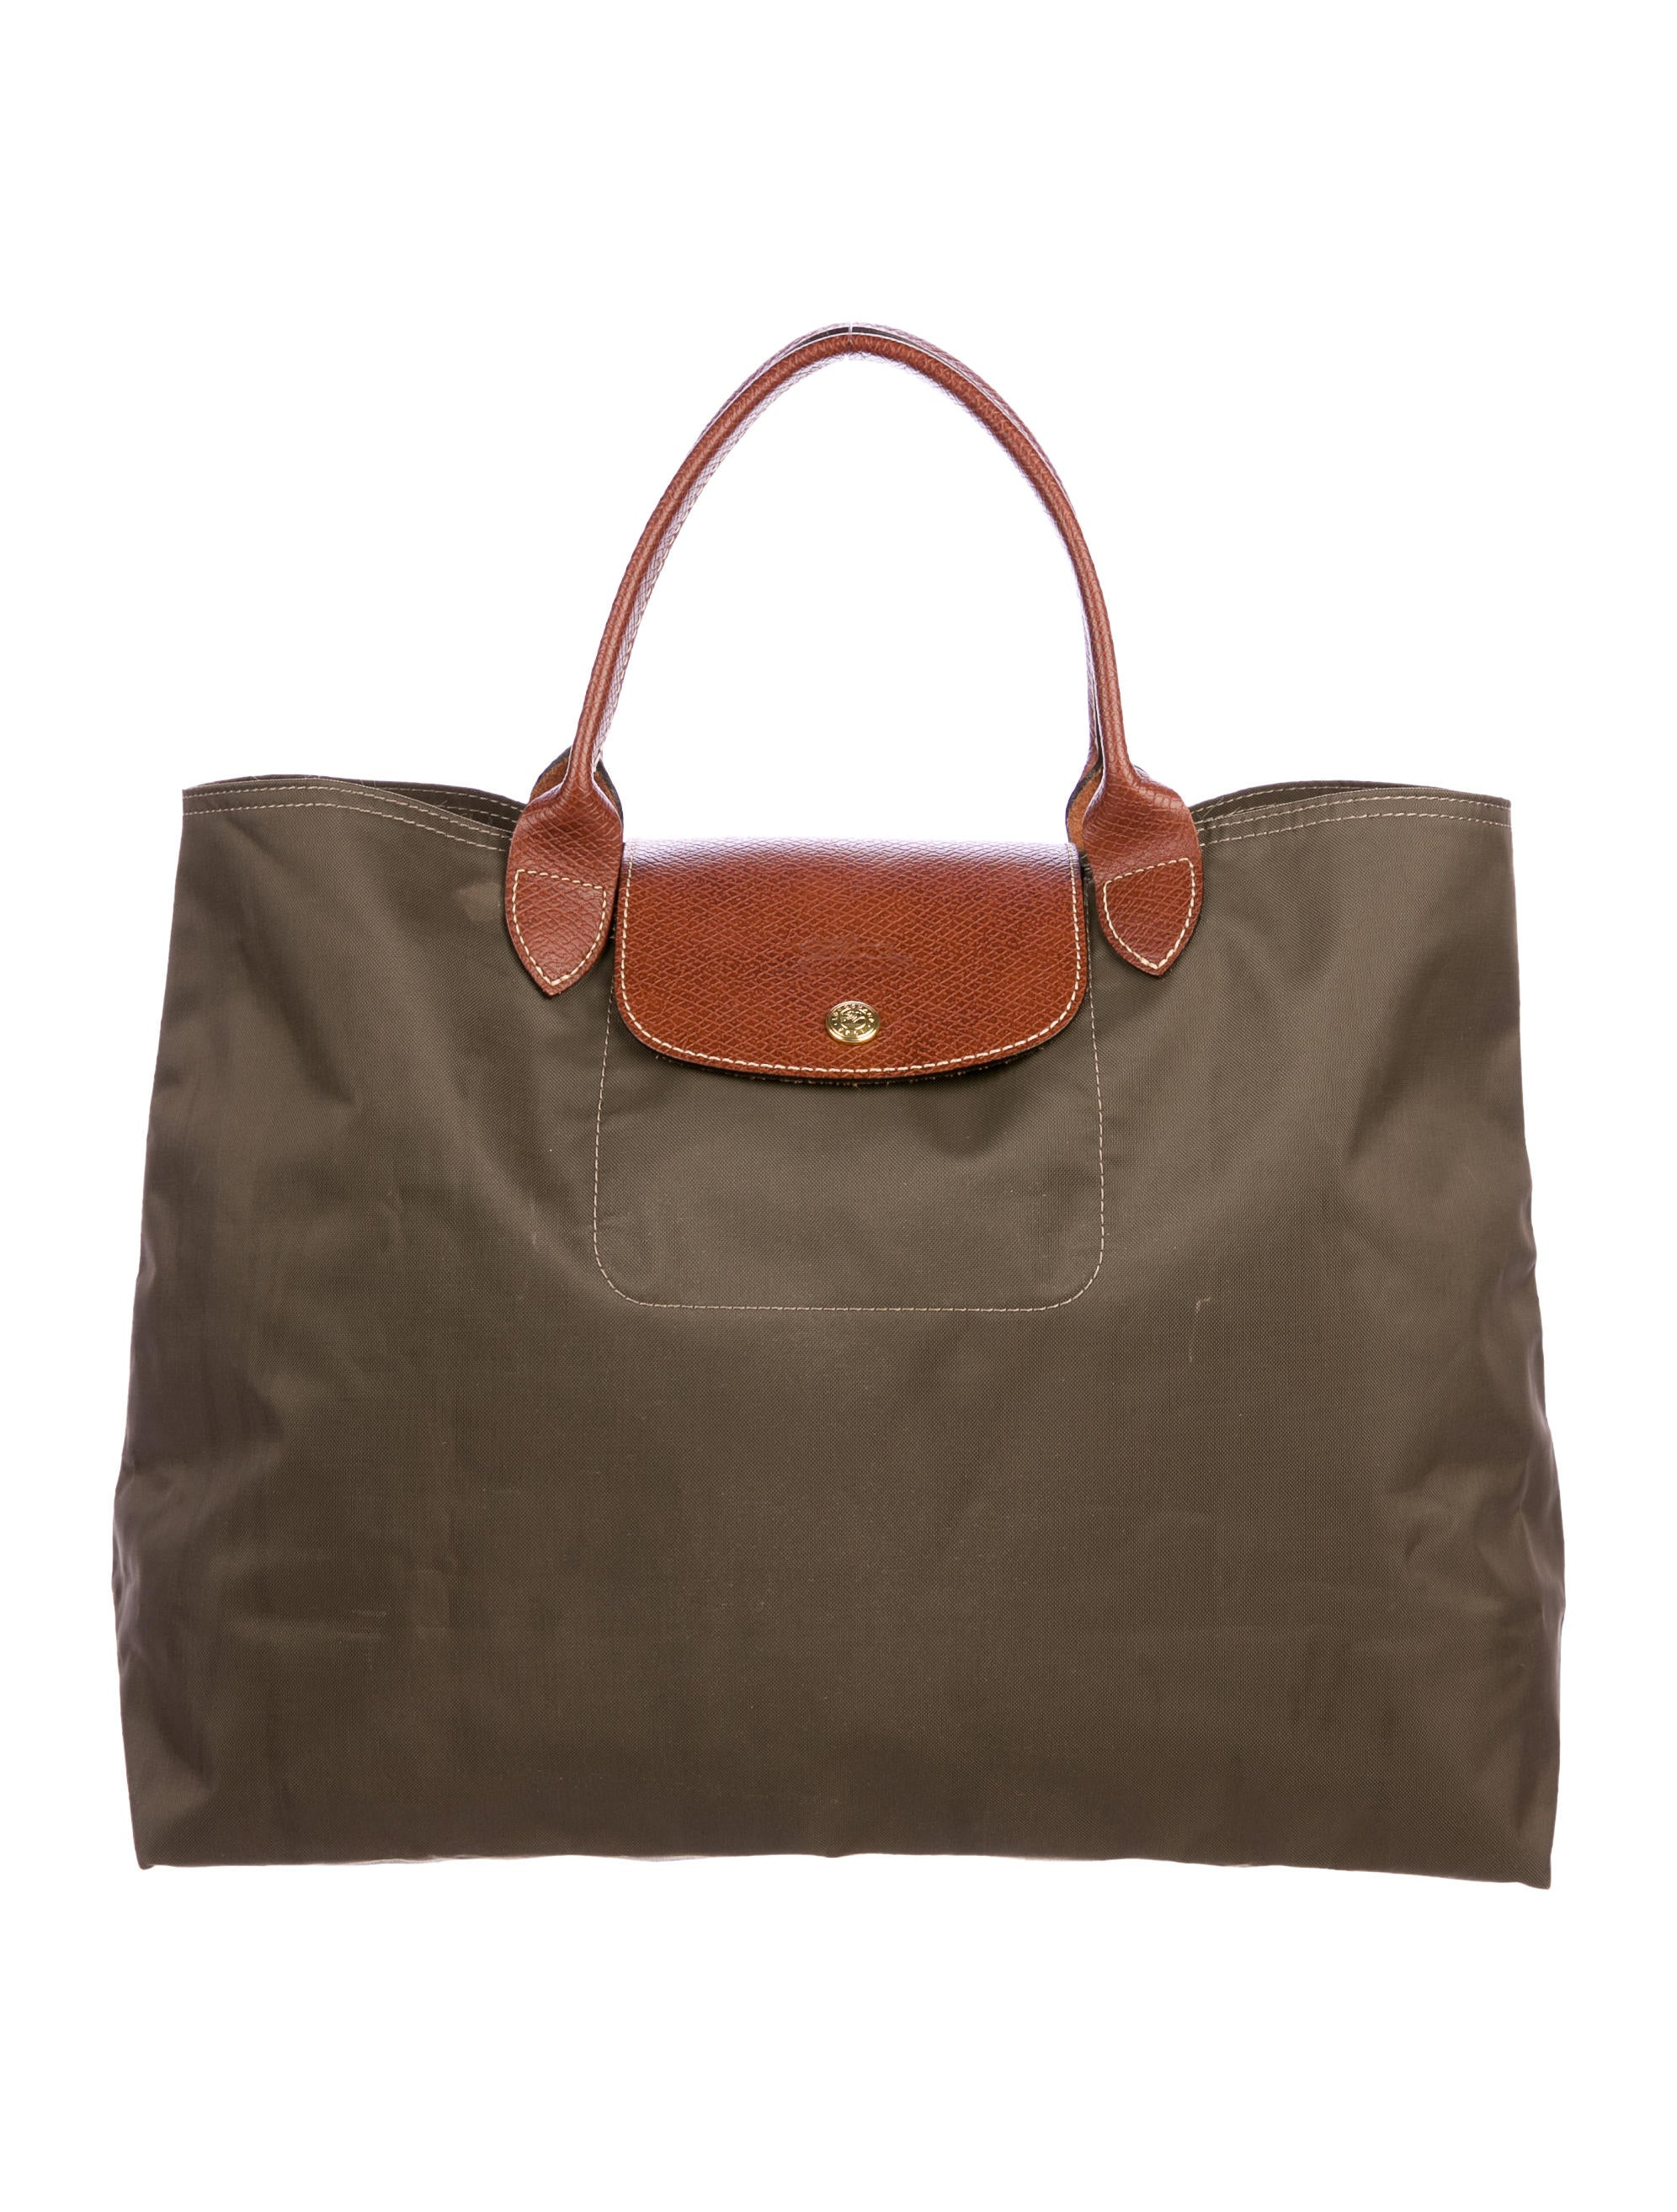 Longchamp Le Pliage Cabas Open Tote - Handbags - WL821348 | The ...